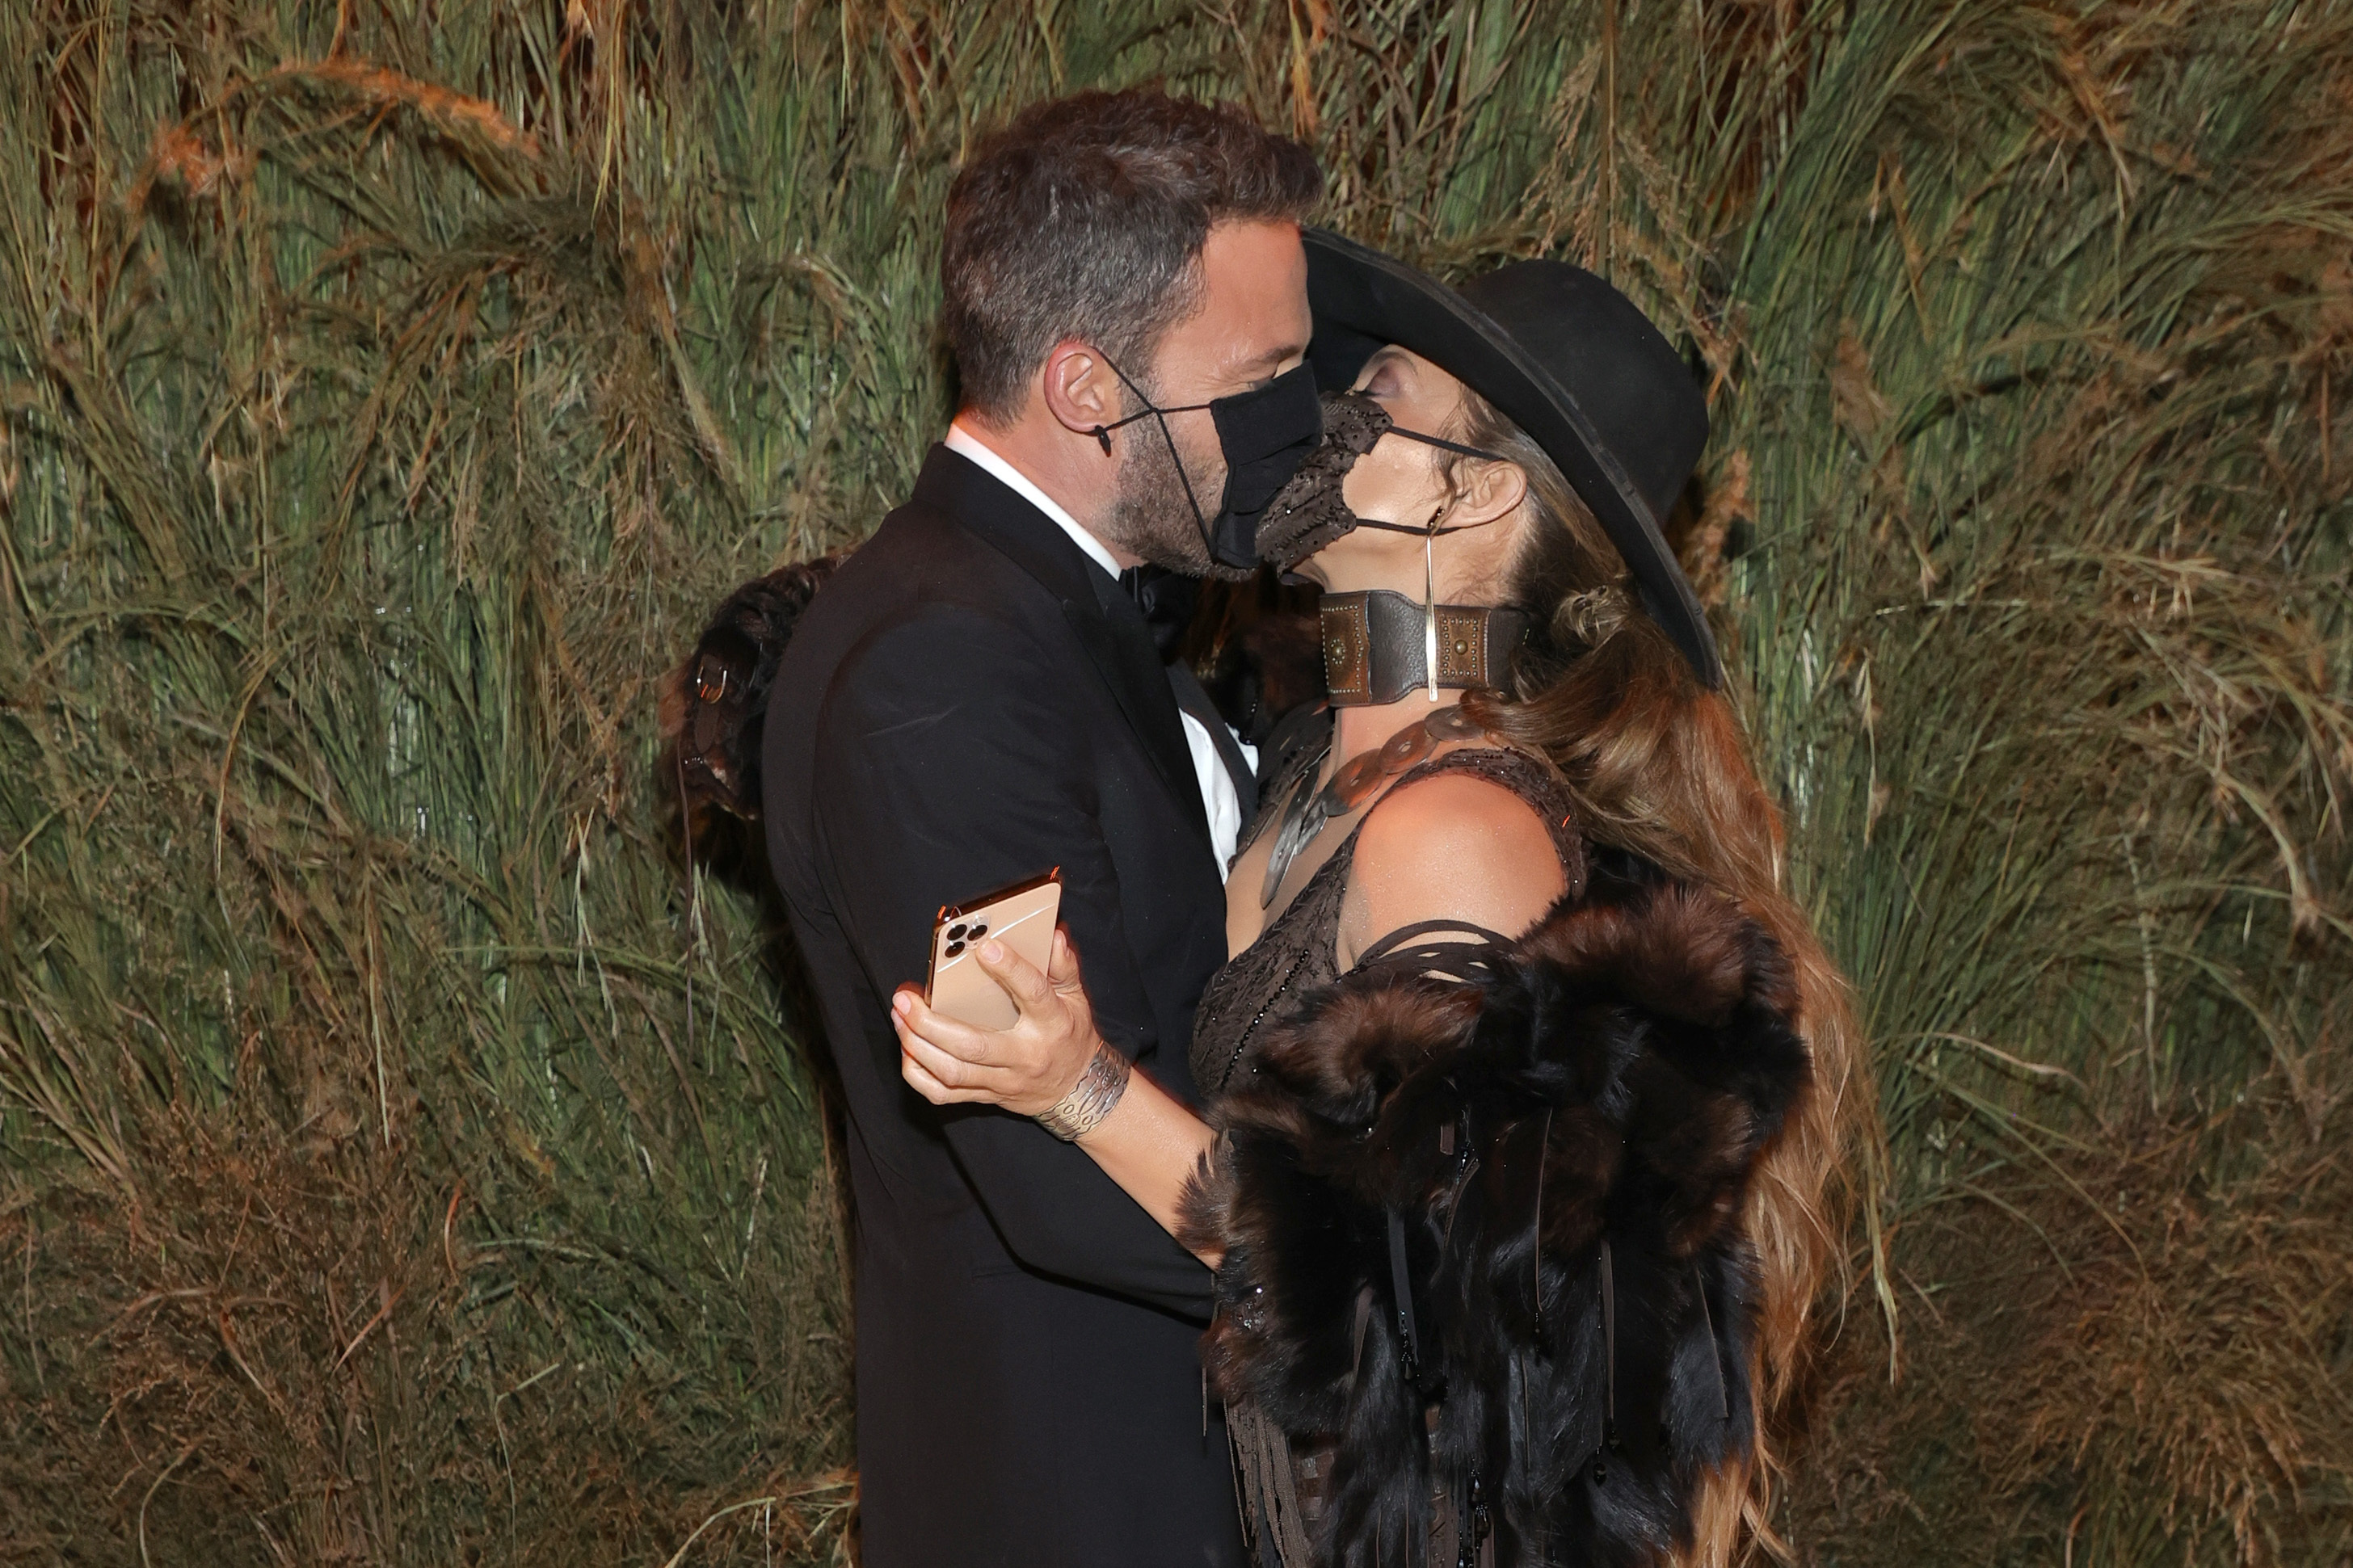 Met Gala 2021: Jennifer Lopez, Ben Affleck and more celebrity couples hit the red carpet